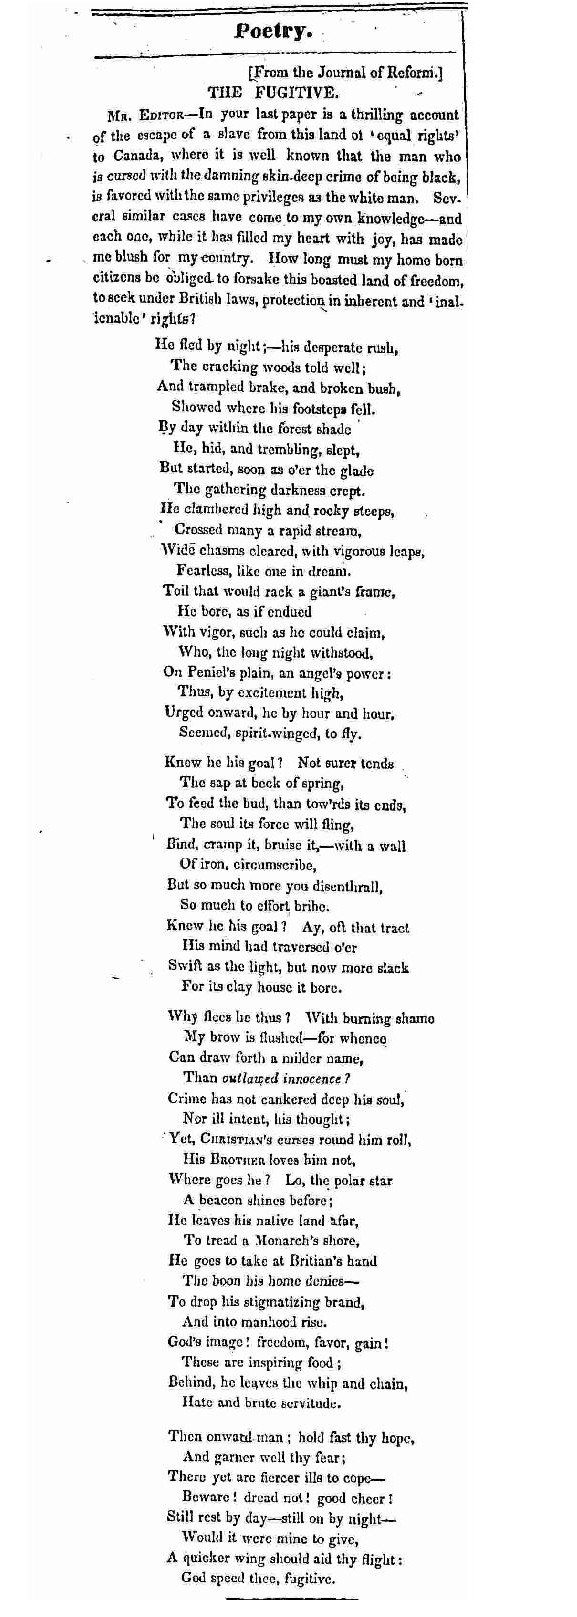 The Friend of Man (Utica, NY) 28 July 2836 No. 6), pg. 24.